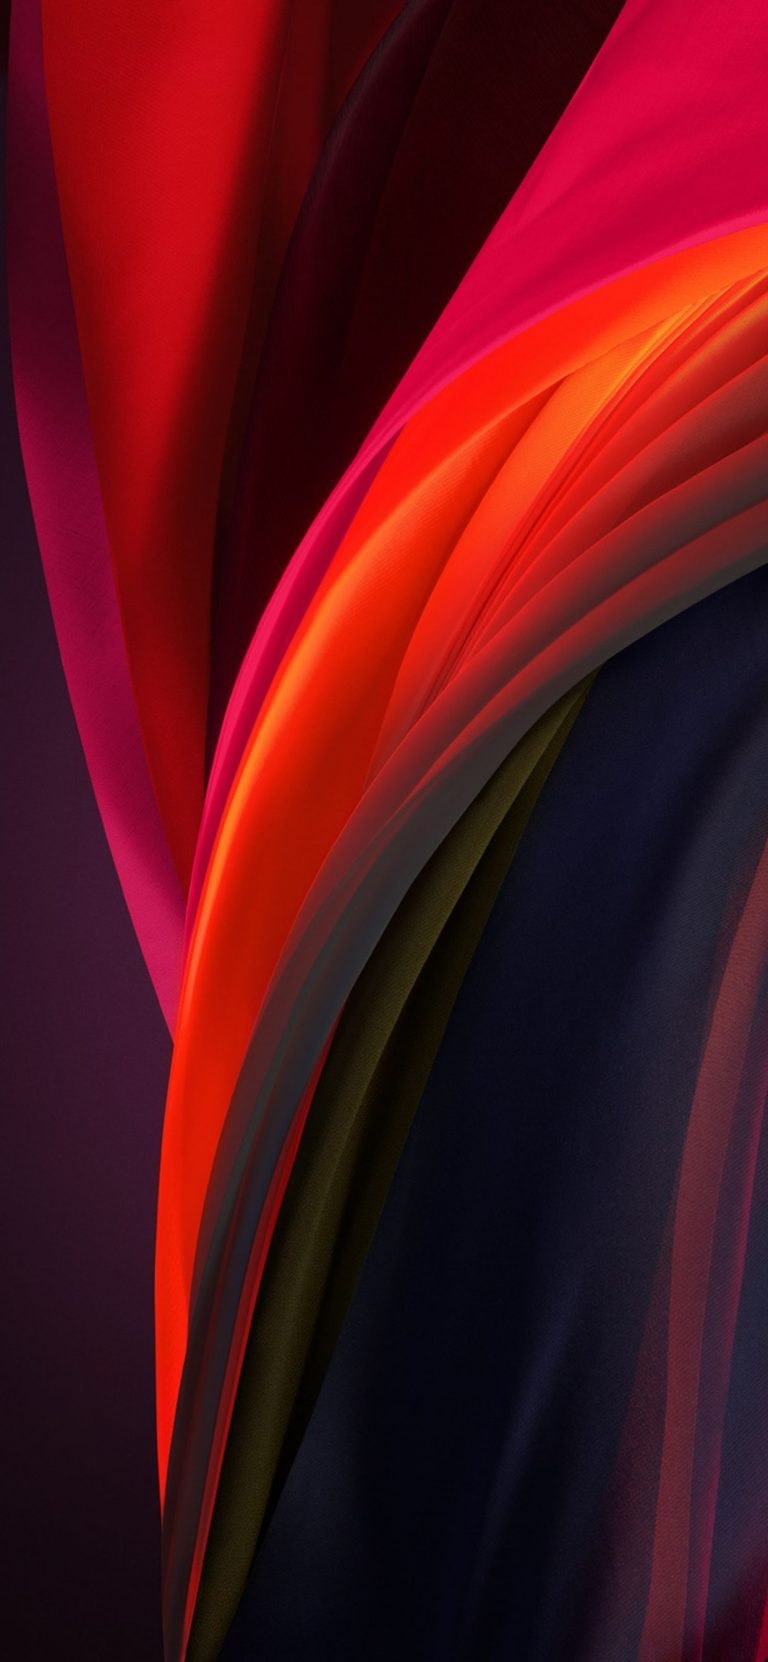 Apple iPhone SE 2020 Stock Wallpaper [1242x2688] - 02